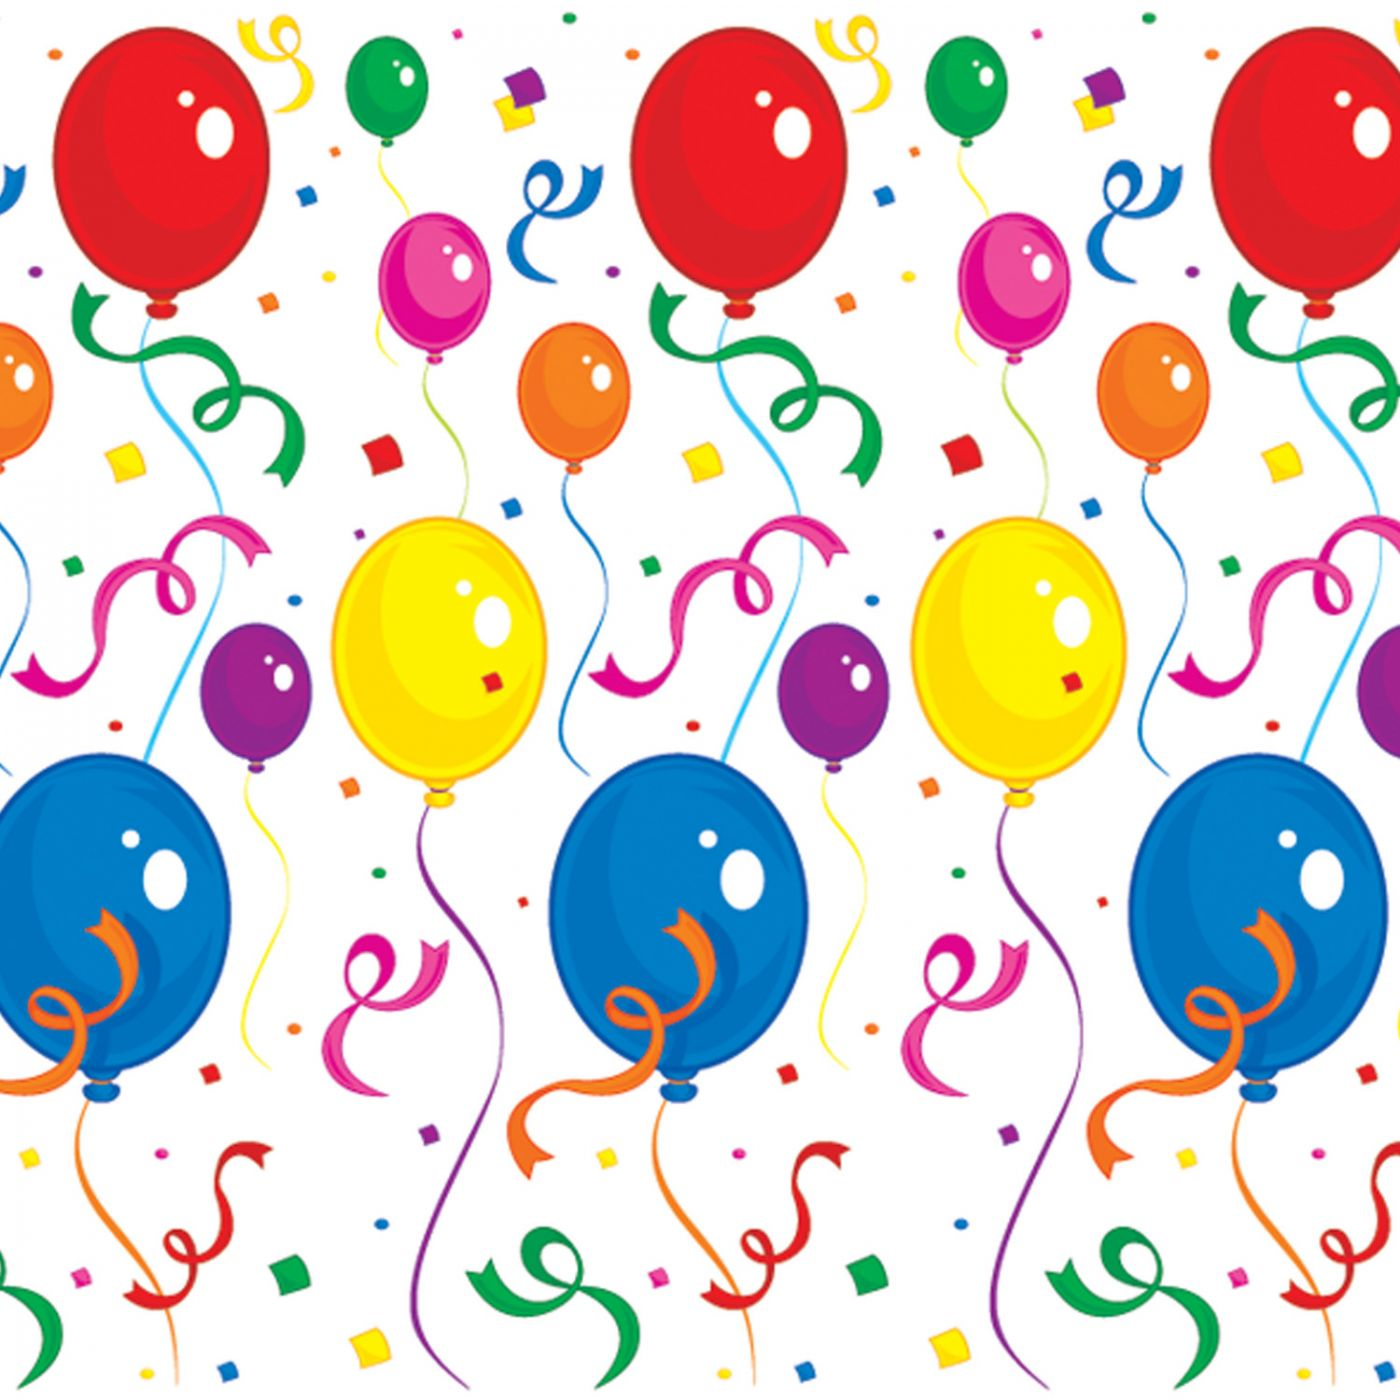 Image of Balloons & Confetti Backdrop (6)